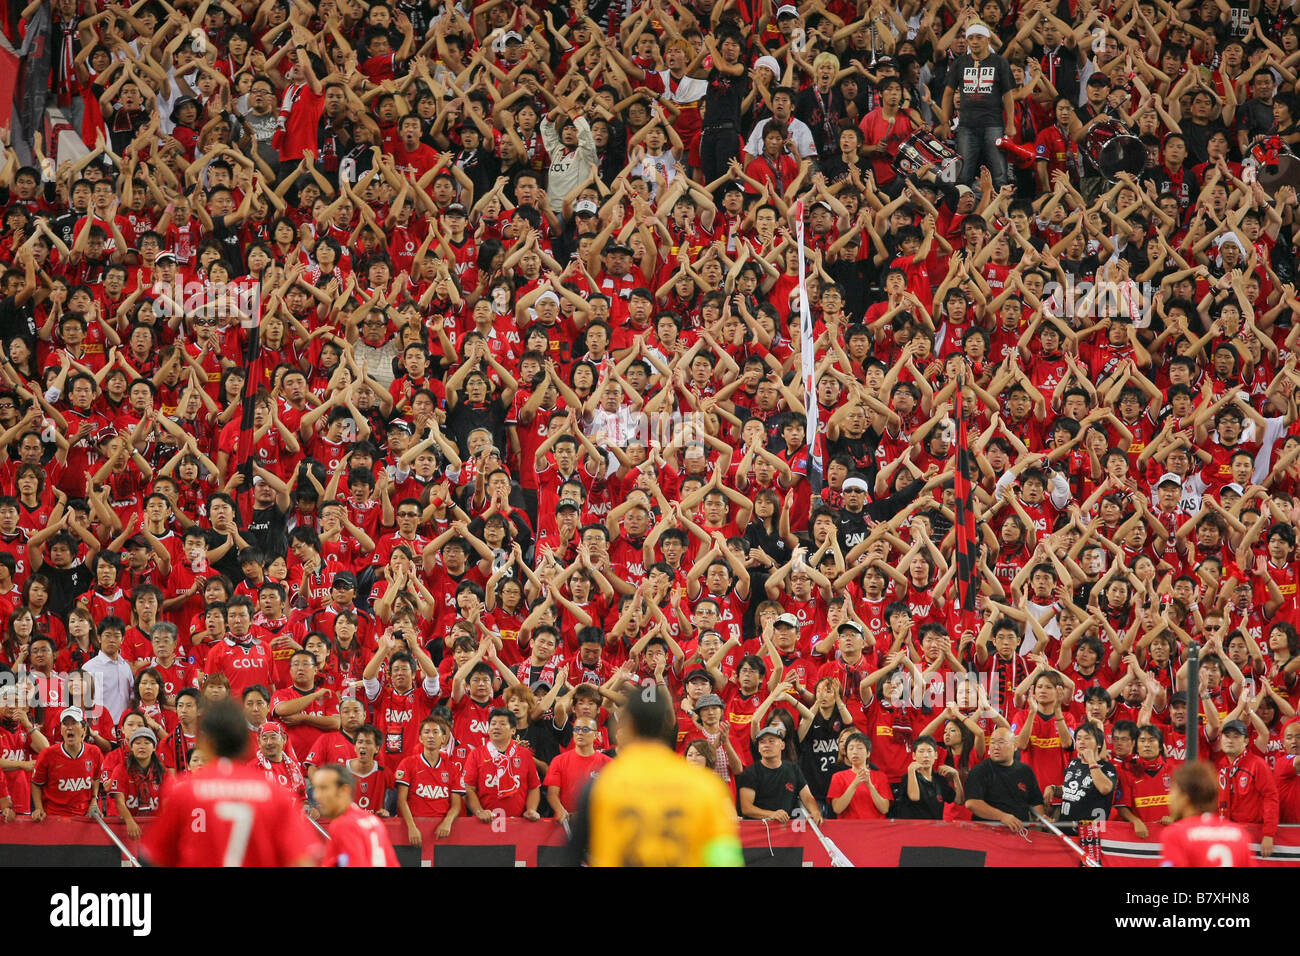 Reds Fans SEPTEMBER 24 2008 Football AFC Champions League 2008 between Urawa Red Diamonds 2 0 Al Qadsia at Saitama - Stock Image